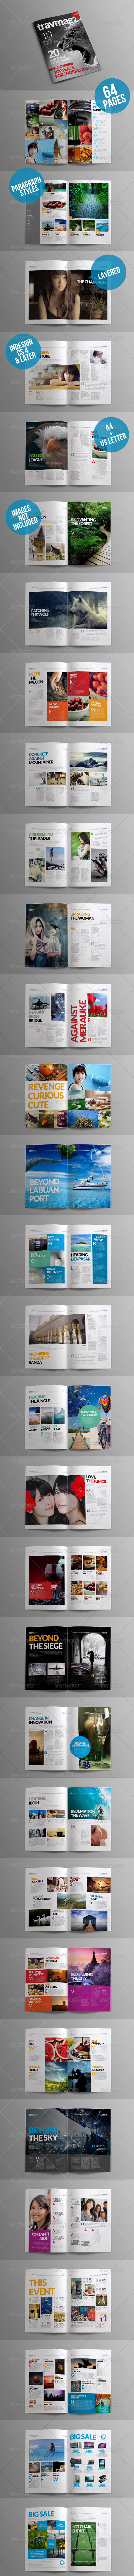 Simple Magazine Volume III - Magazines Print Templates